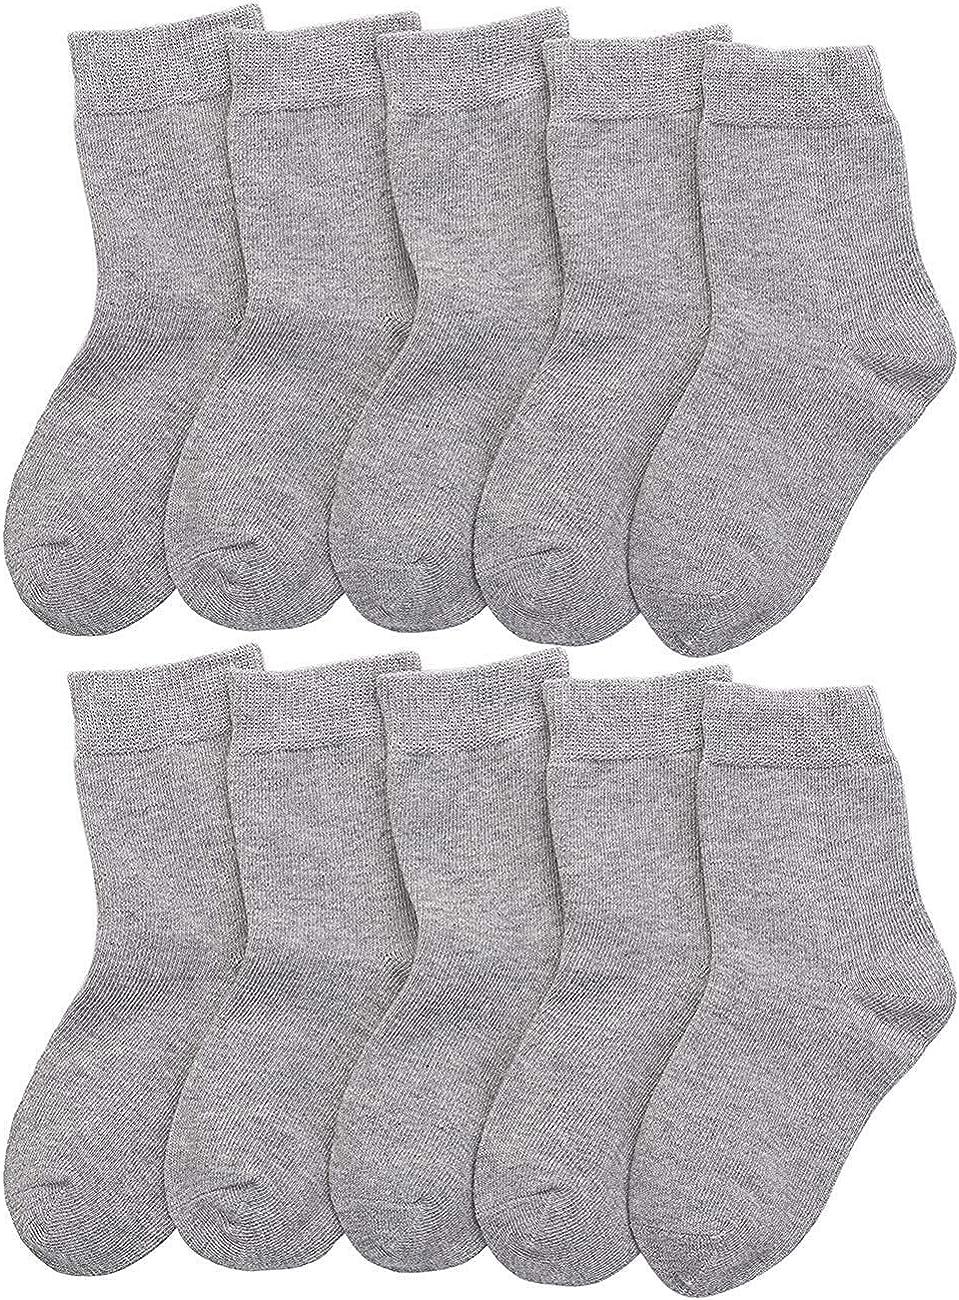 CHUNG Toddler Boys Girls 10/12 Pairs Athletic Cotton Basic Crew Socks Autumn School Uniform Casual Sports